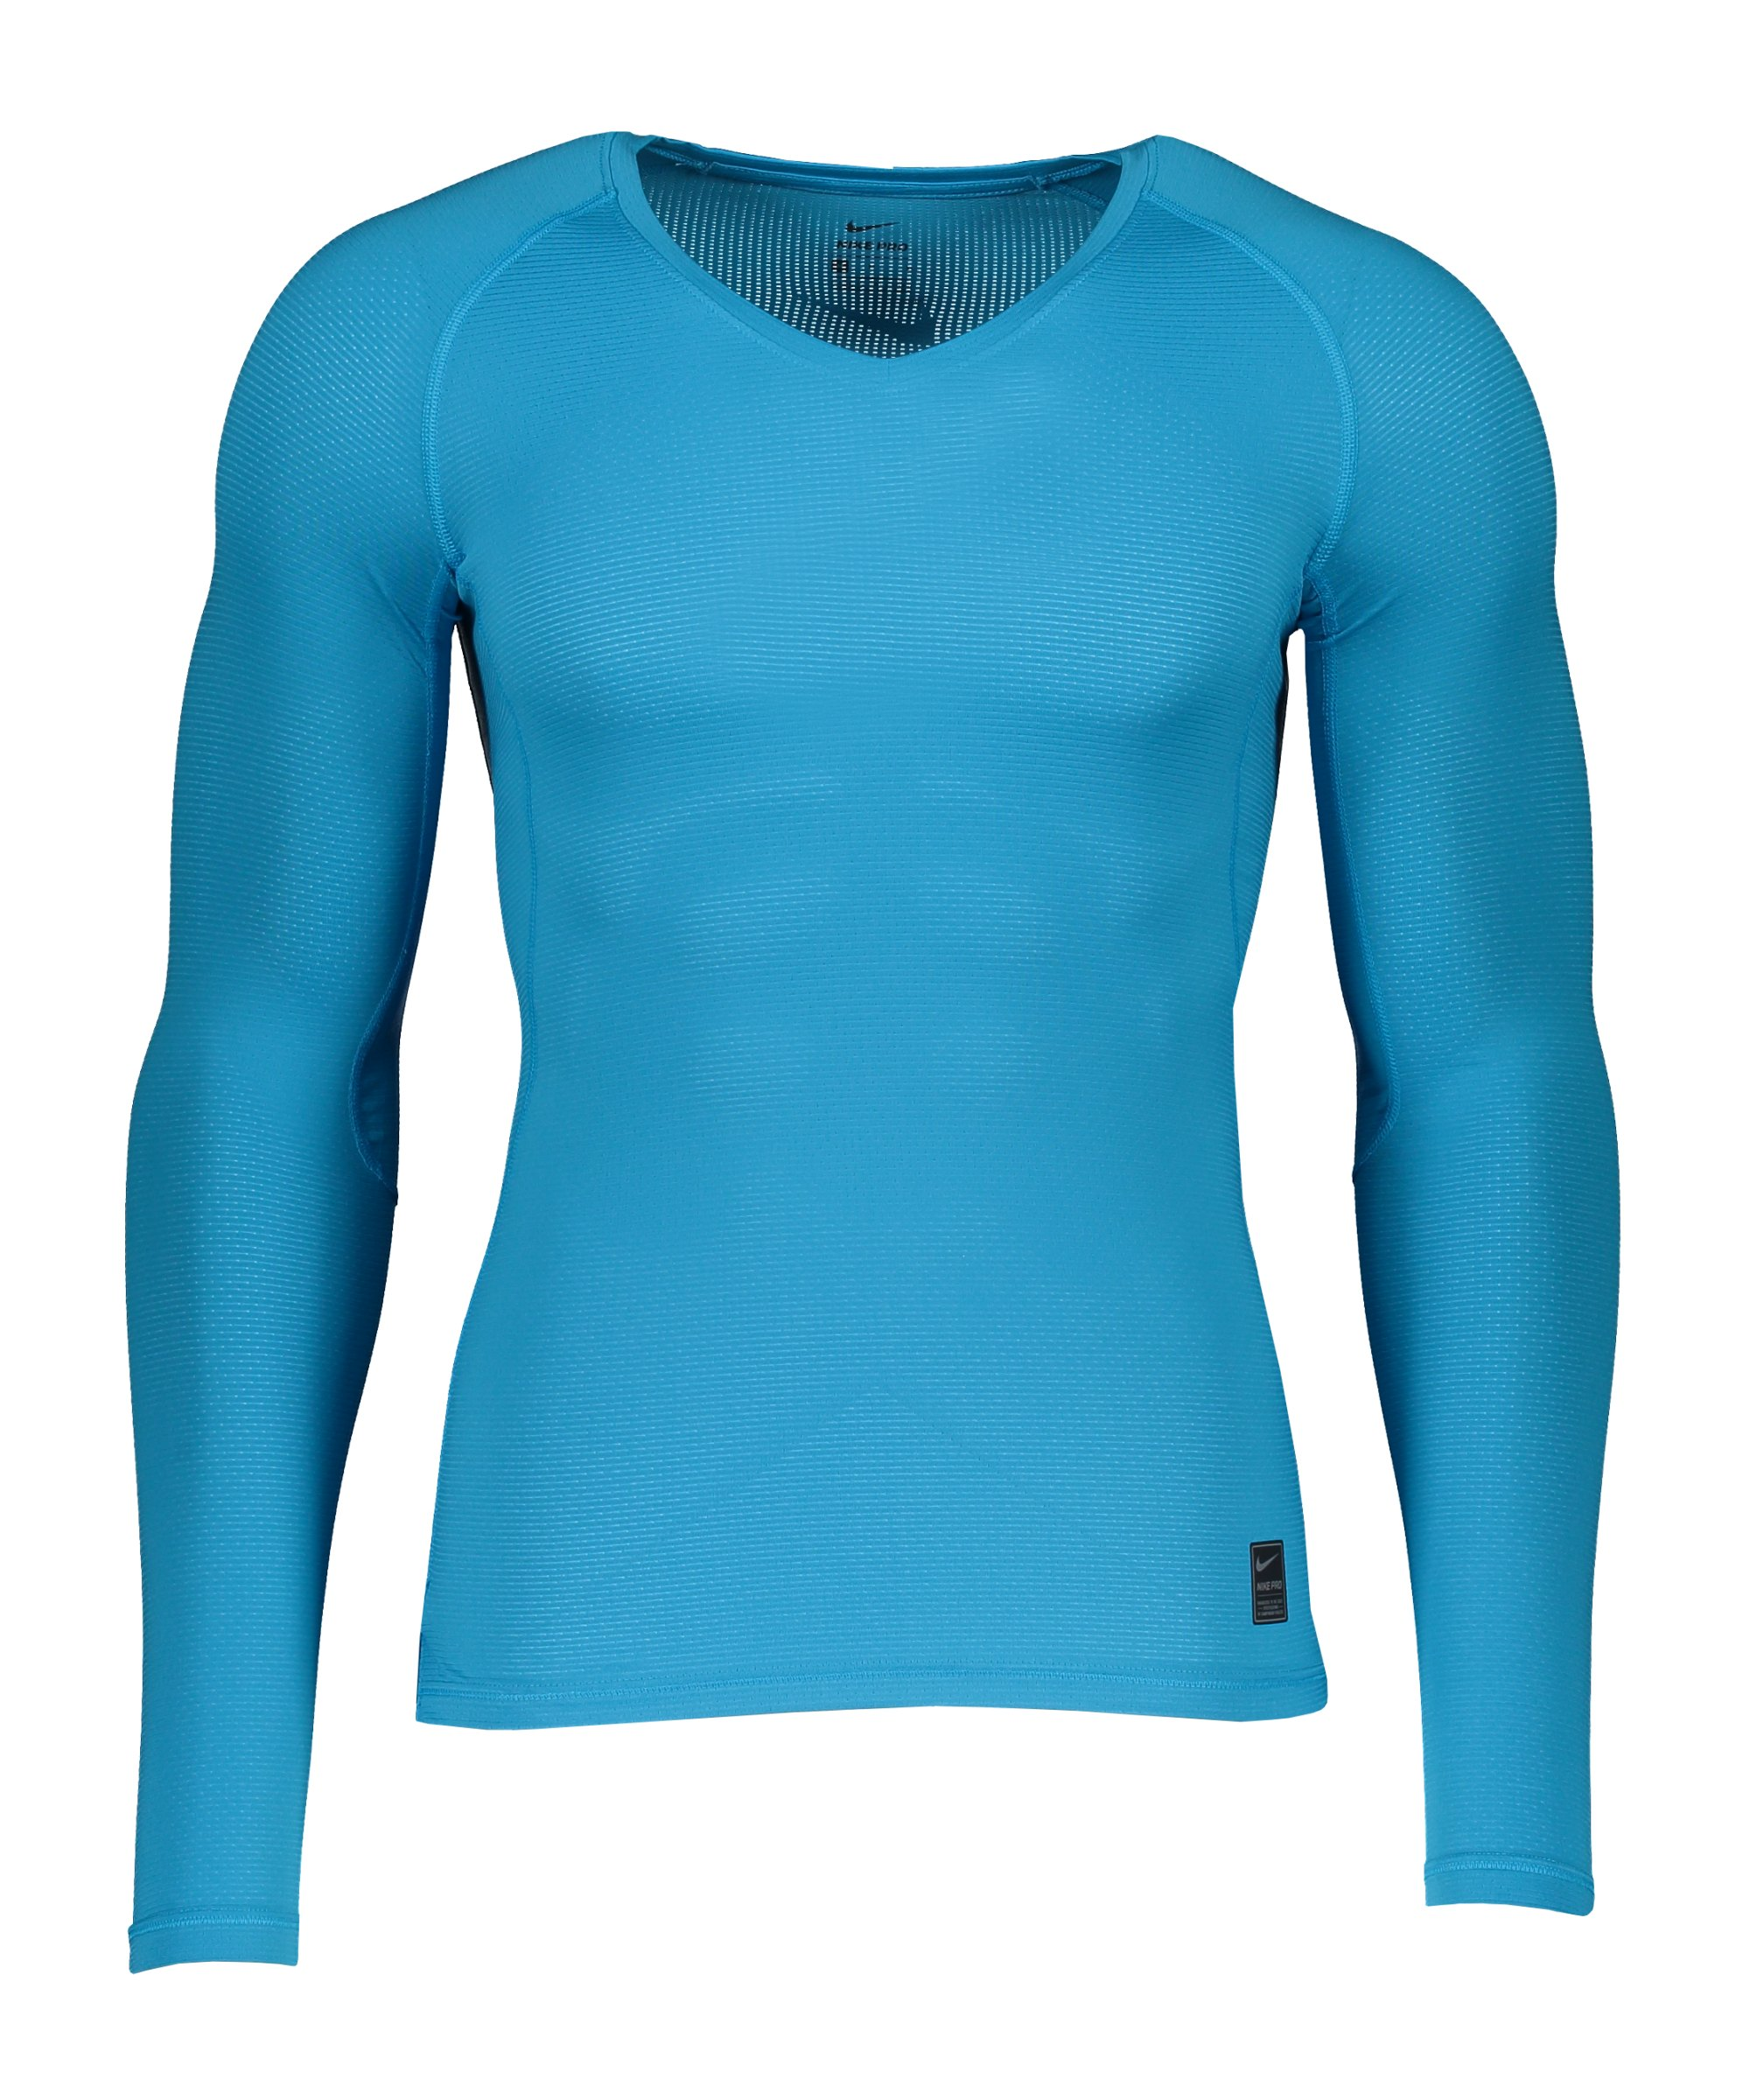 Nike Pro Hypercool Comp Shirt langarm Blau F446 - blau